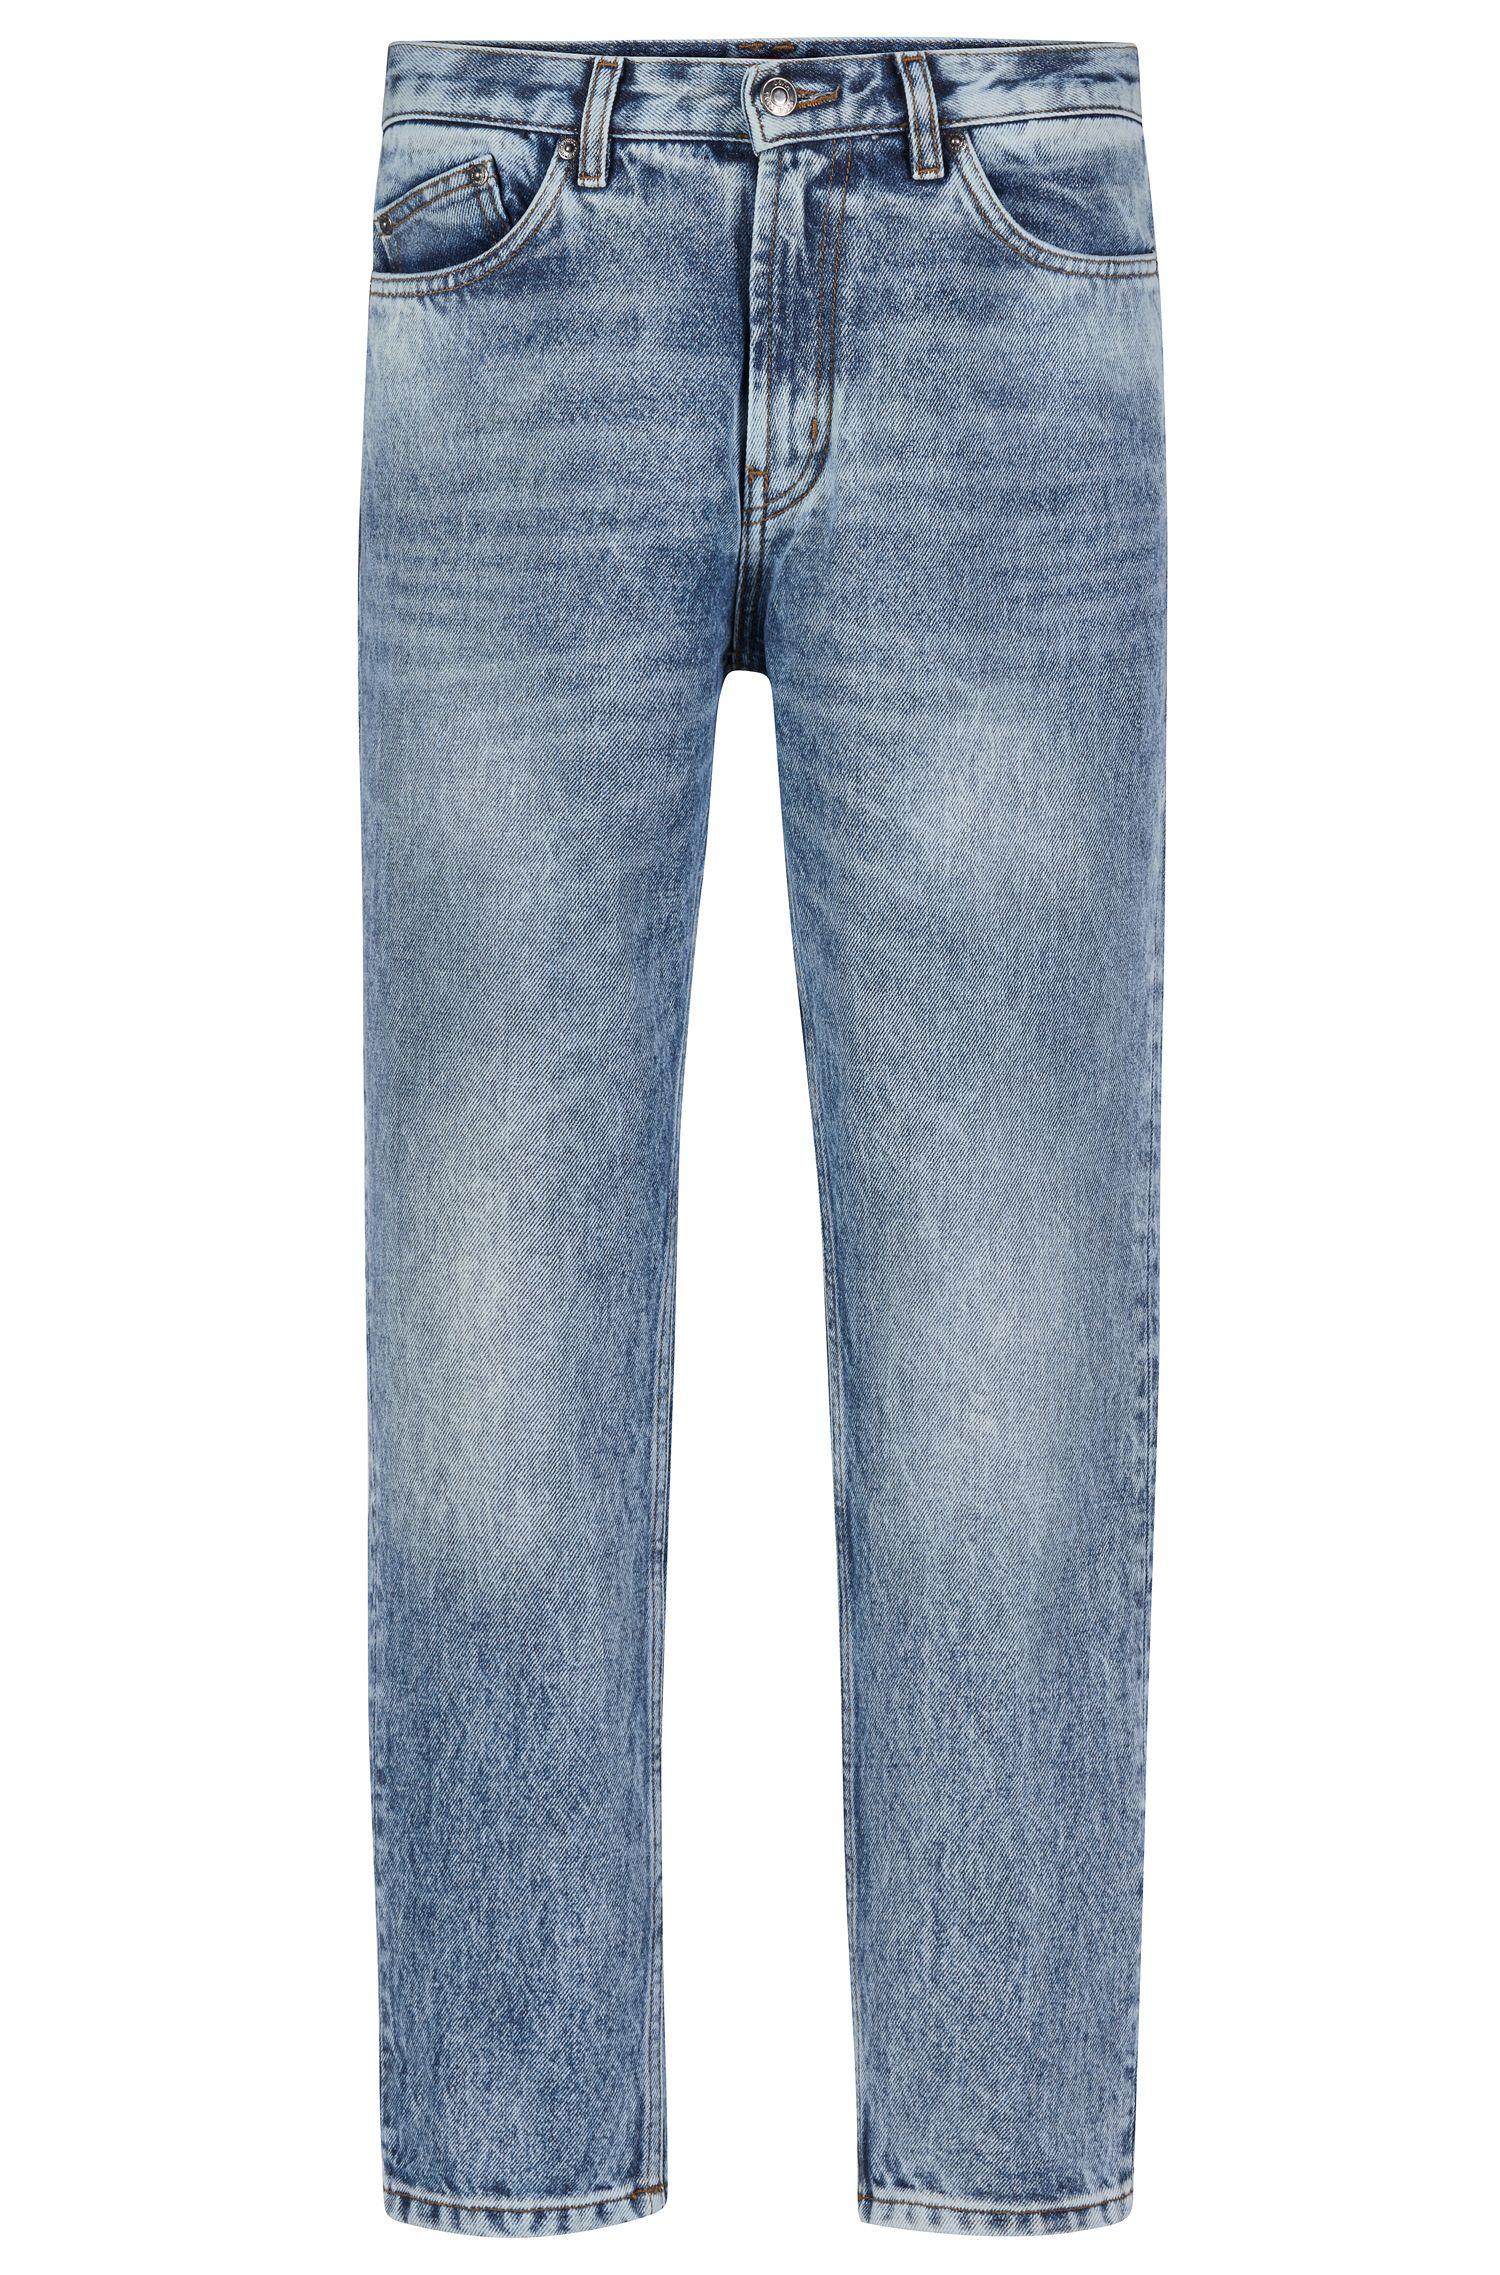 'HUGO 332'   Slim Fit, 12 oz Cotton Jeans